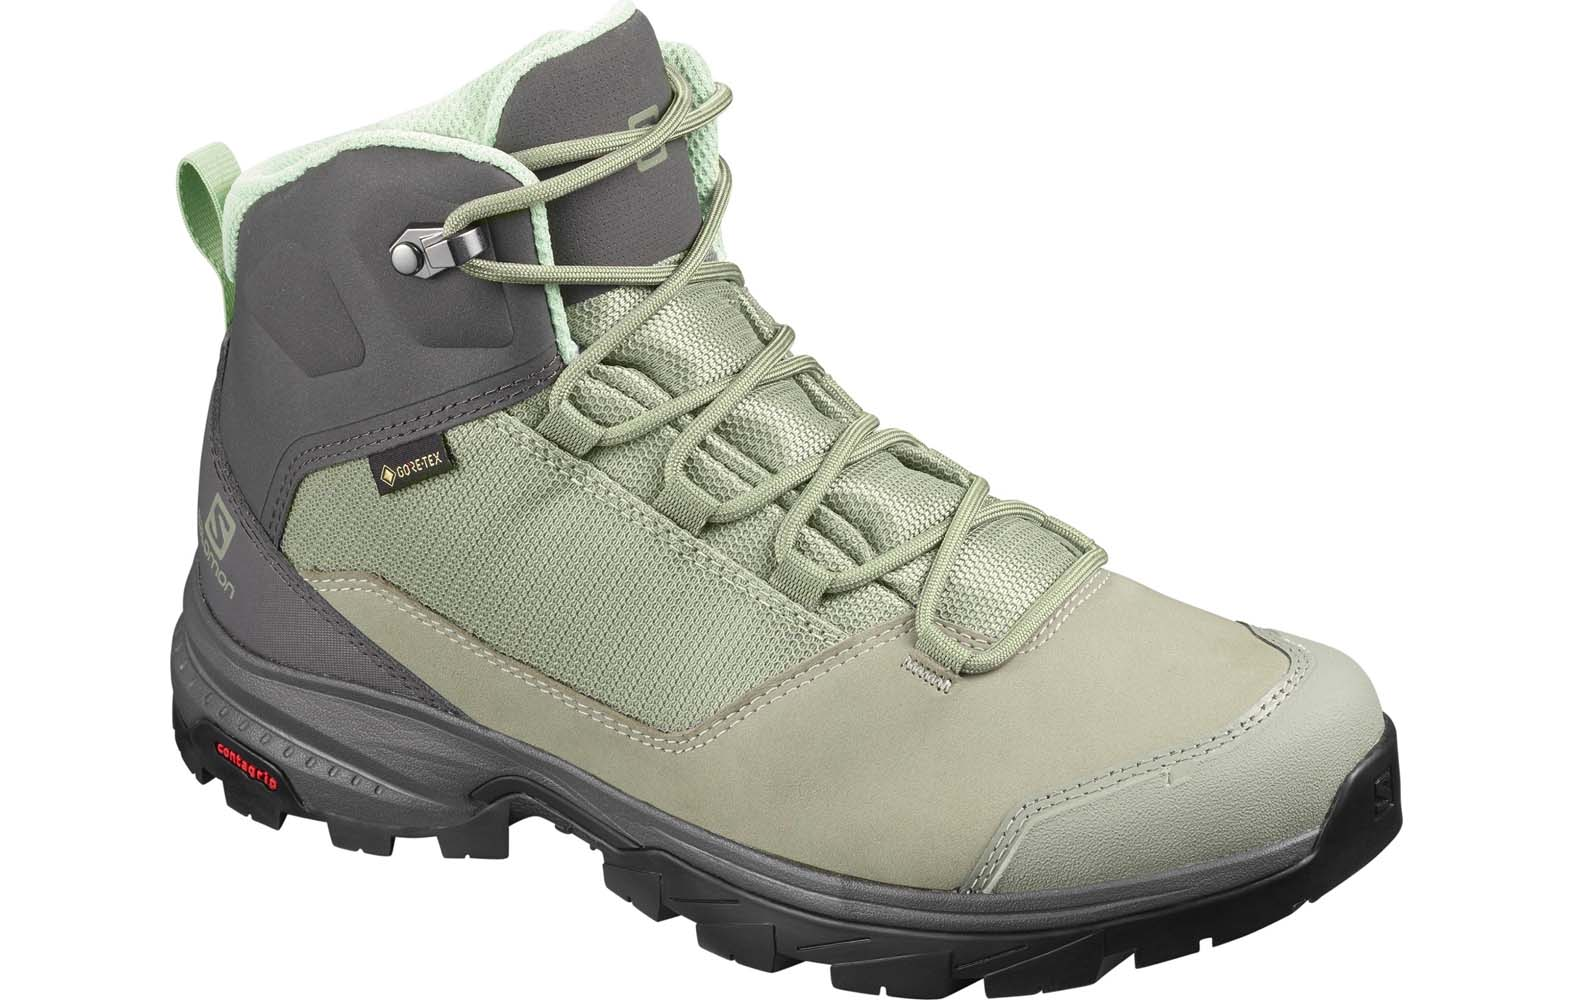 salomon outward mid gtx hiking boot